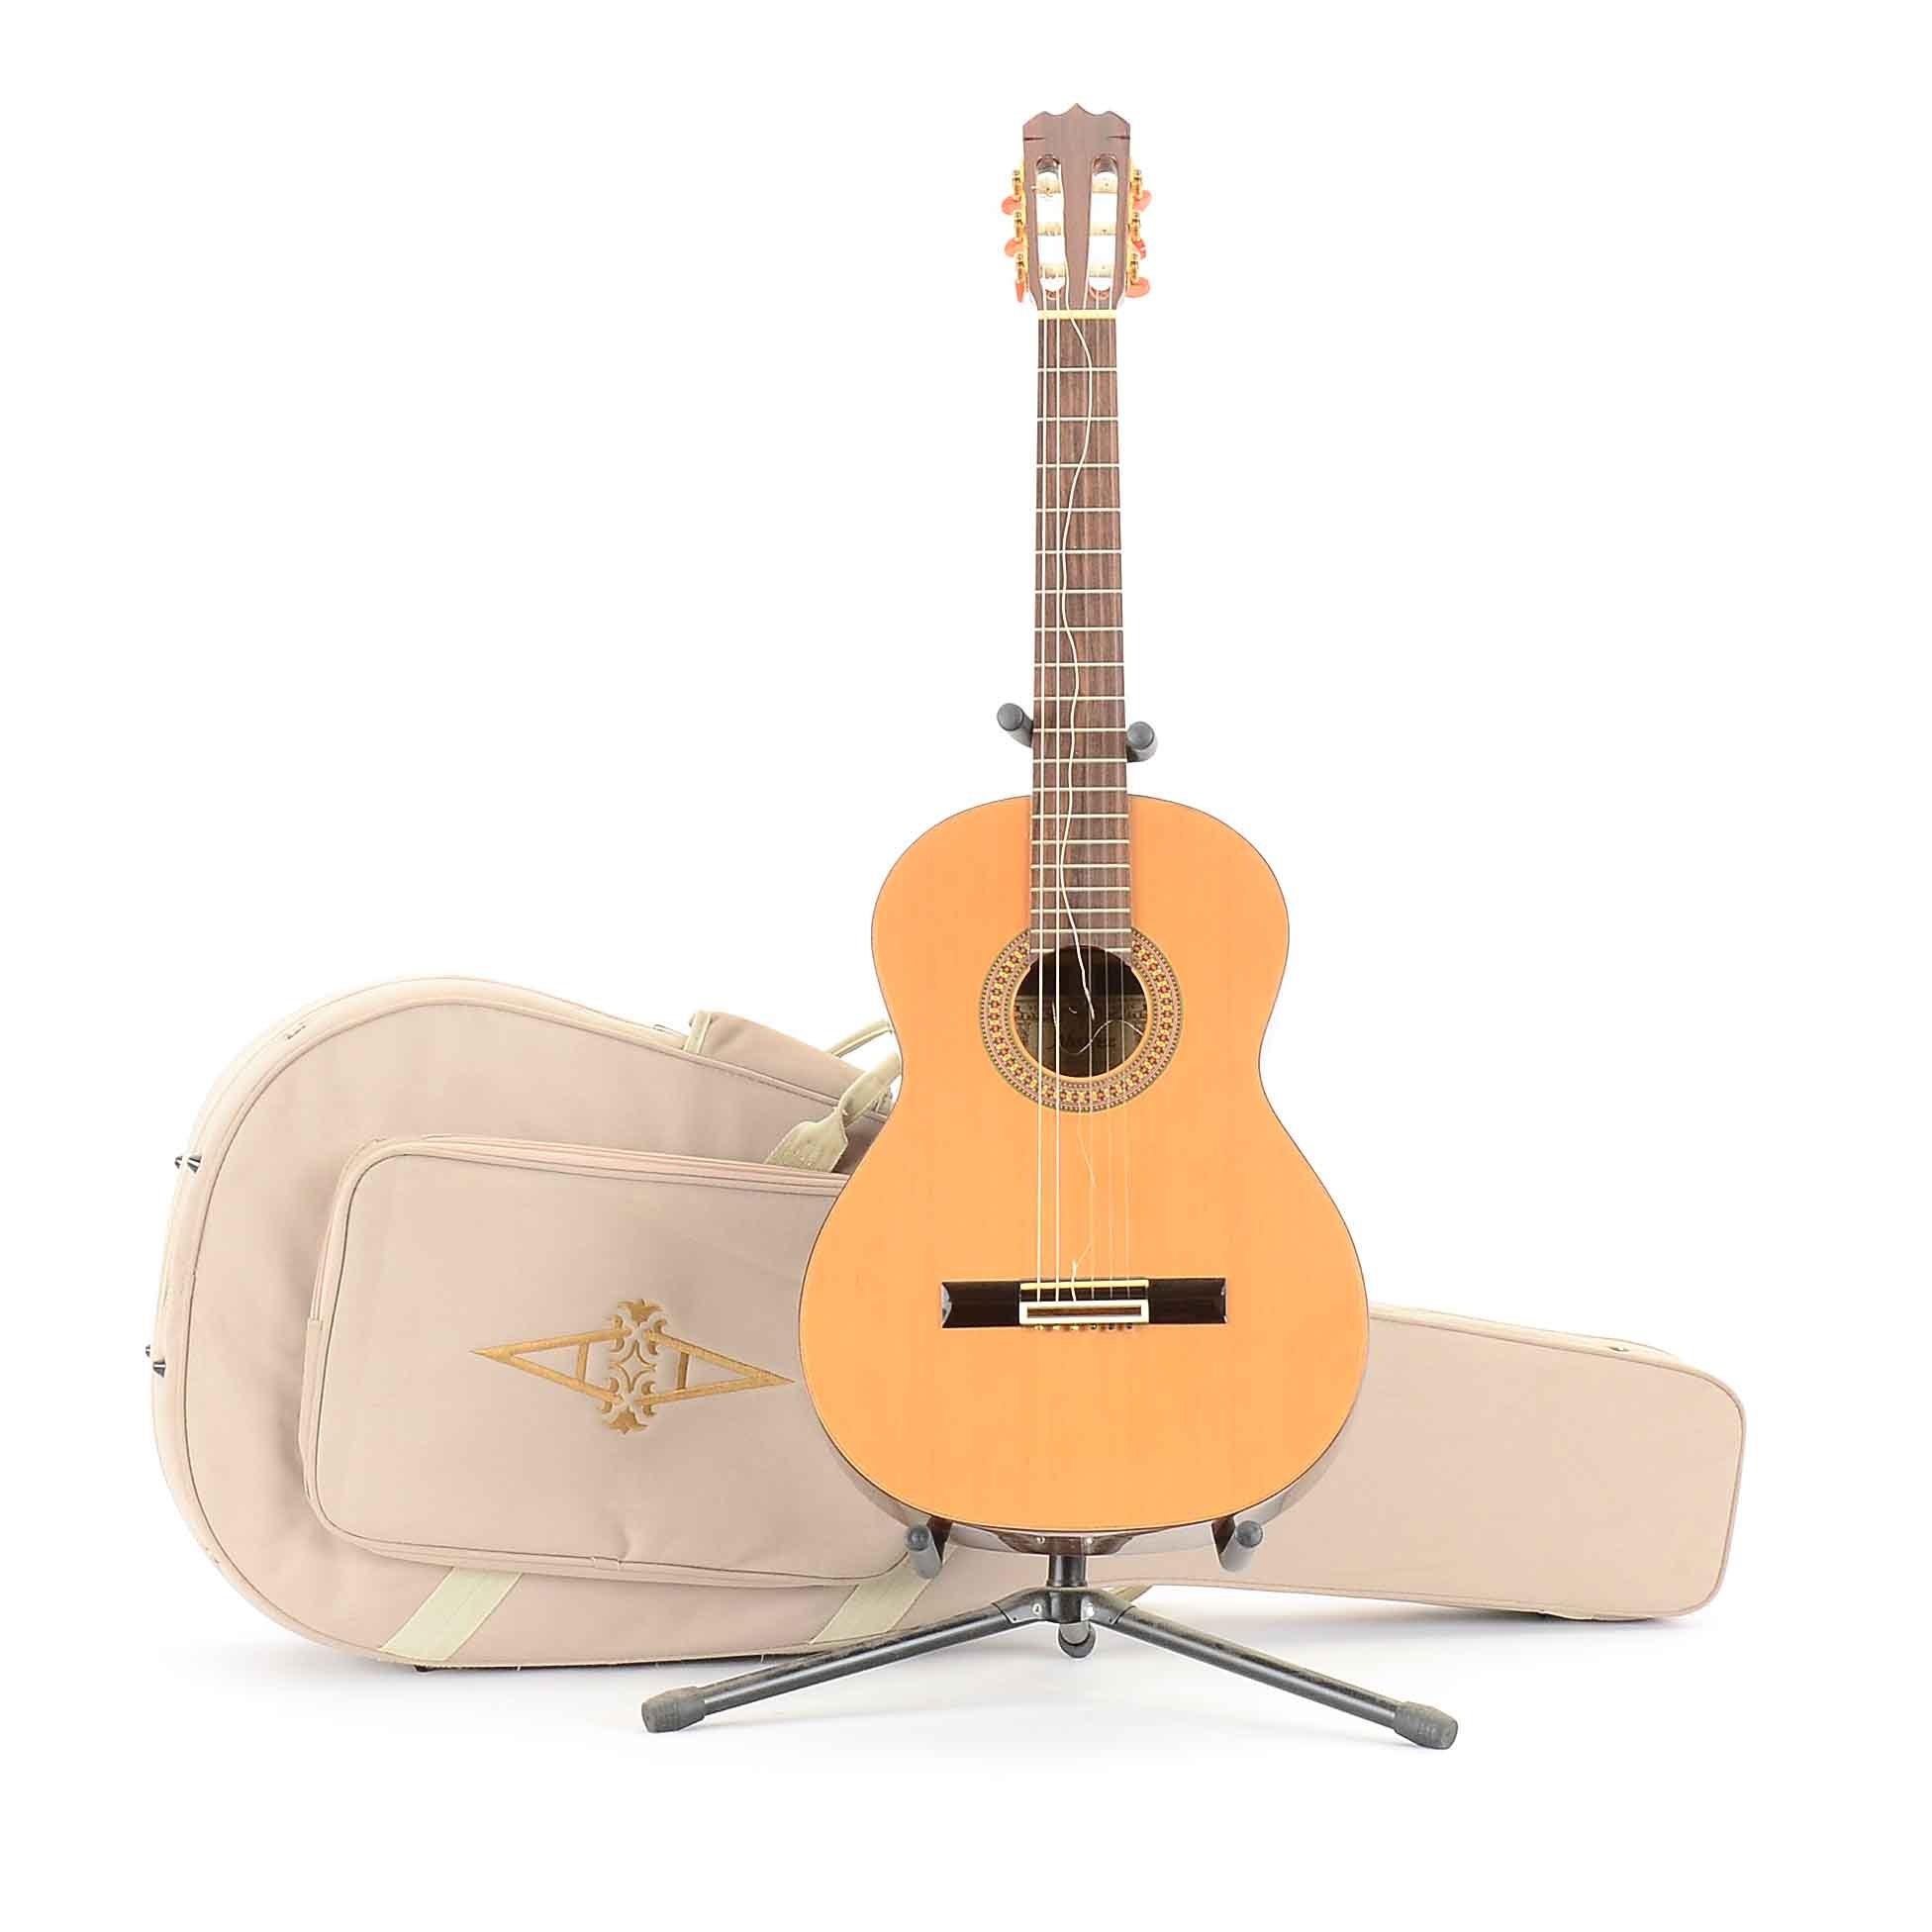 Alvarez Classical Acoustic Guitar with Case